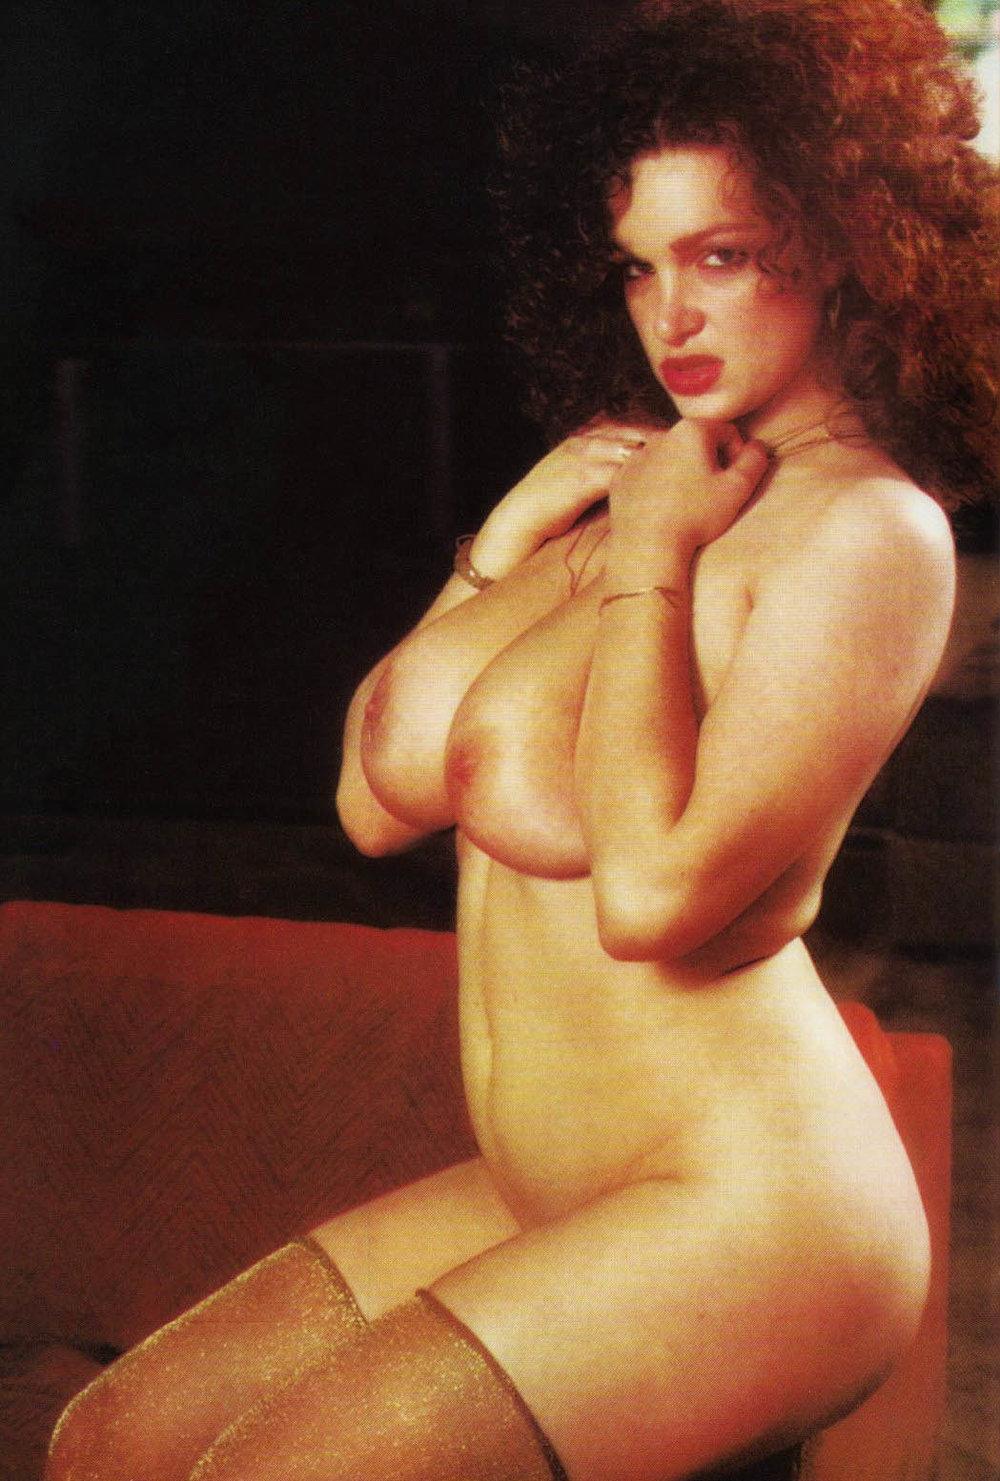 Jewish Porn Star Sue Nero Susan Nero 09.jpg